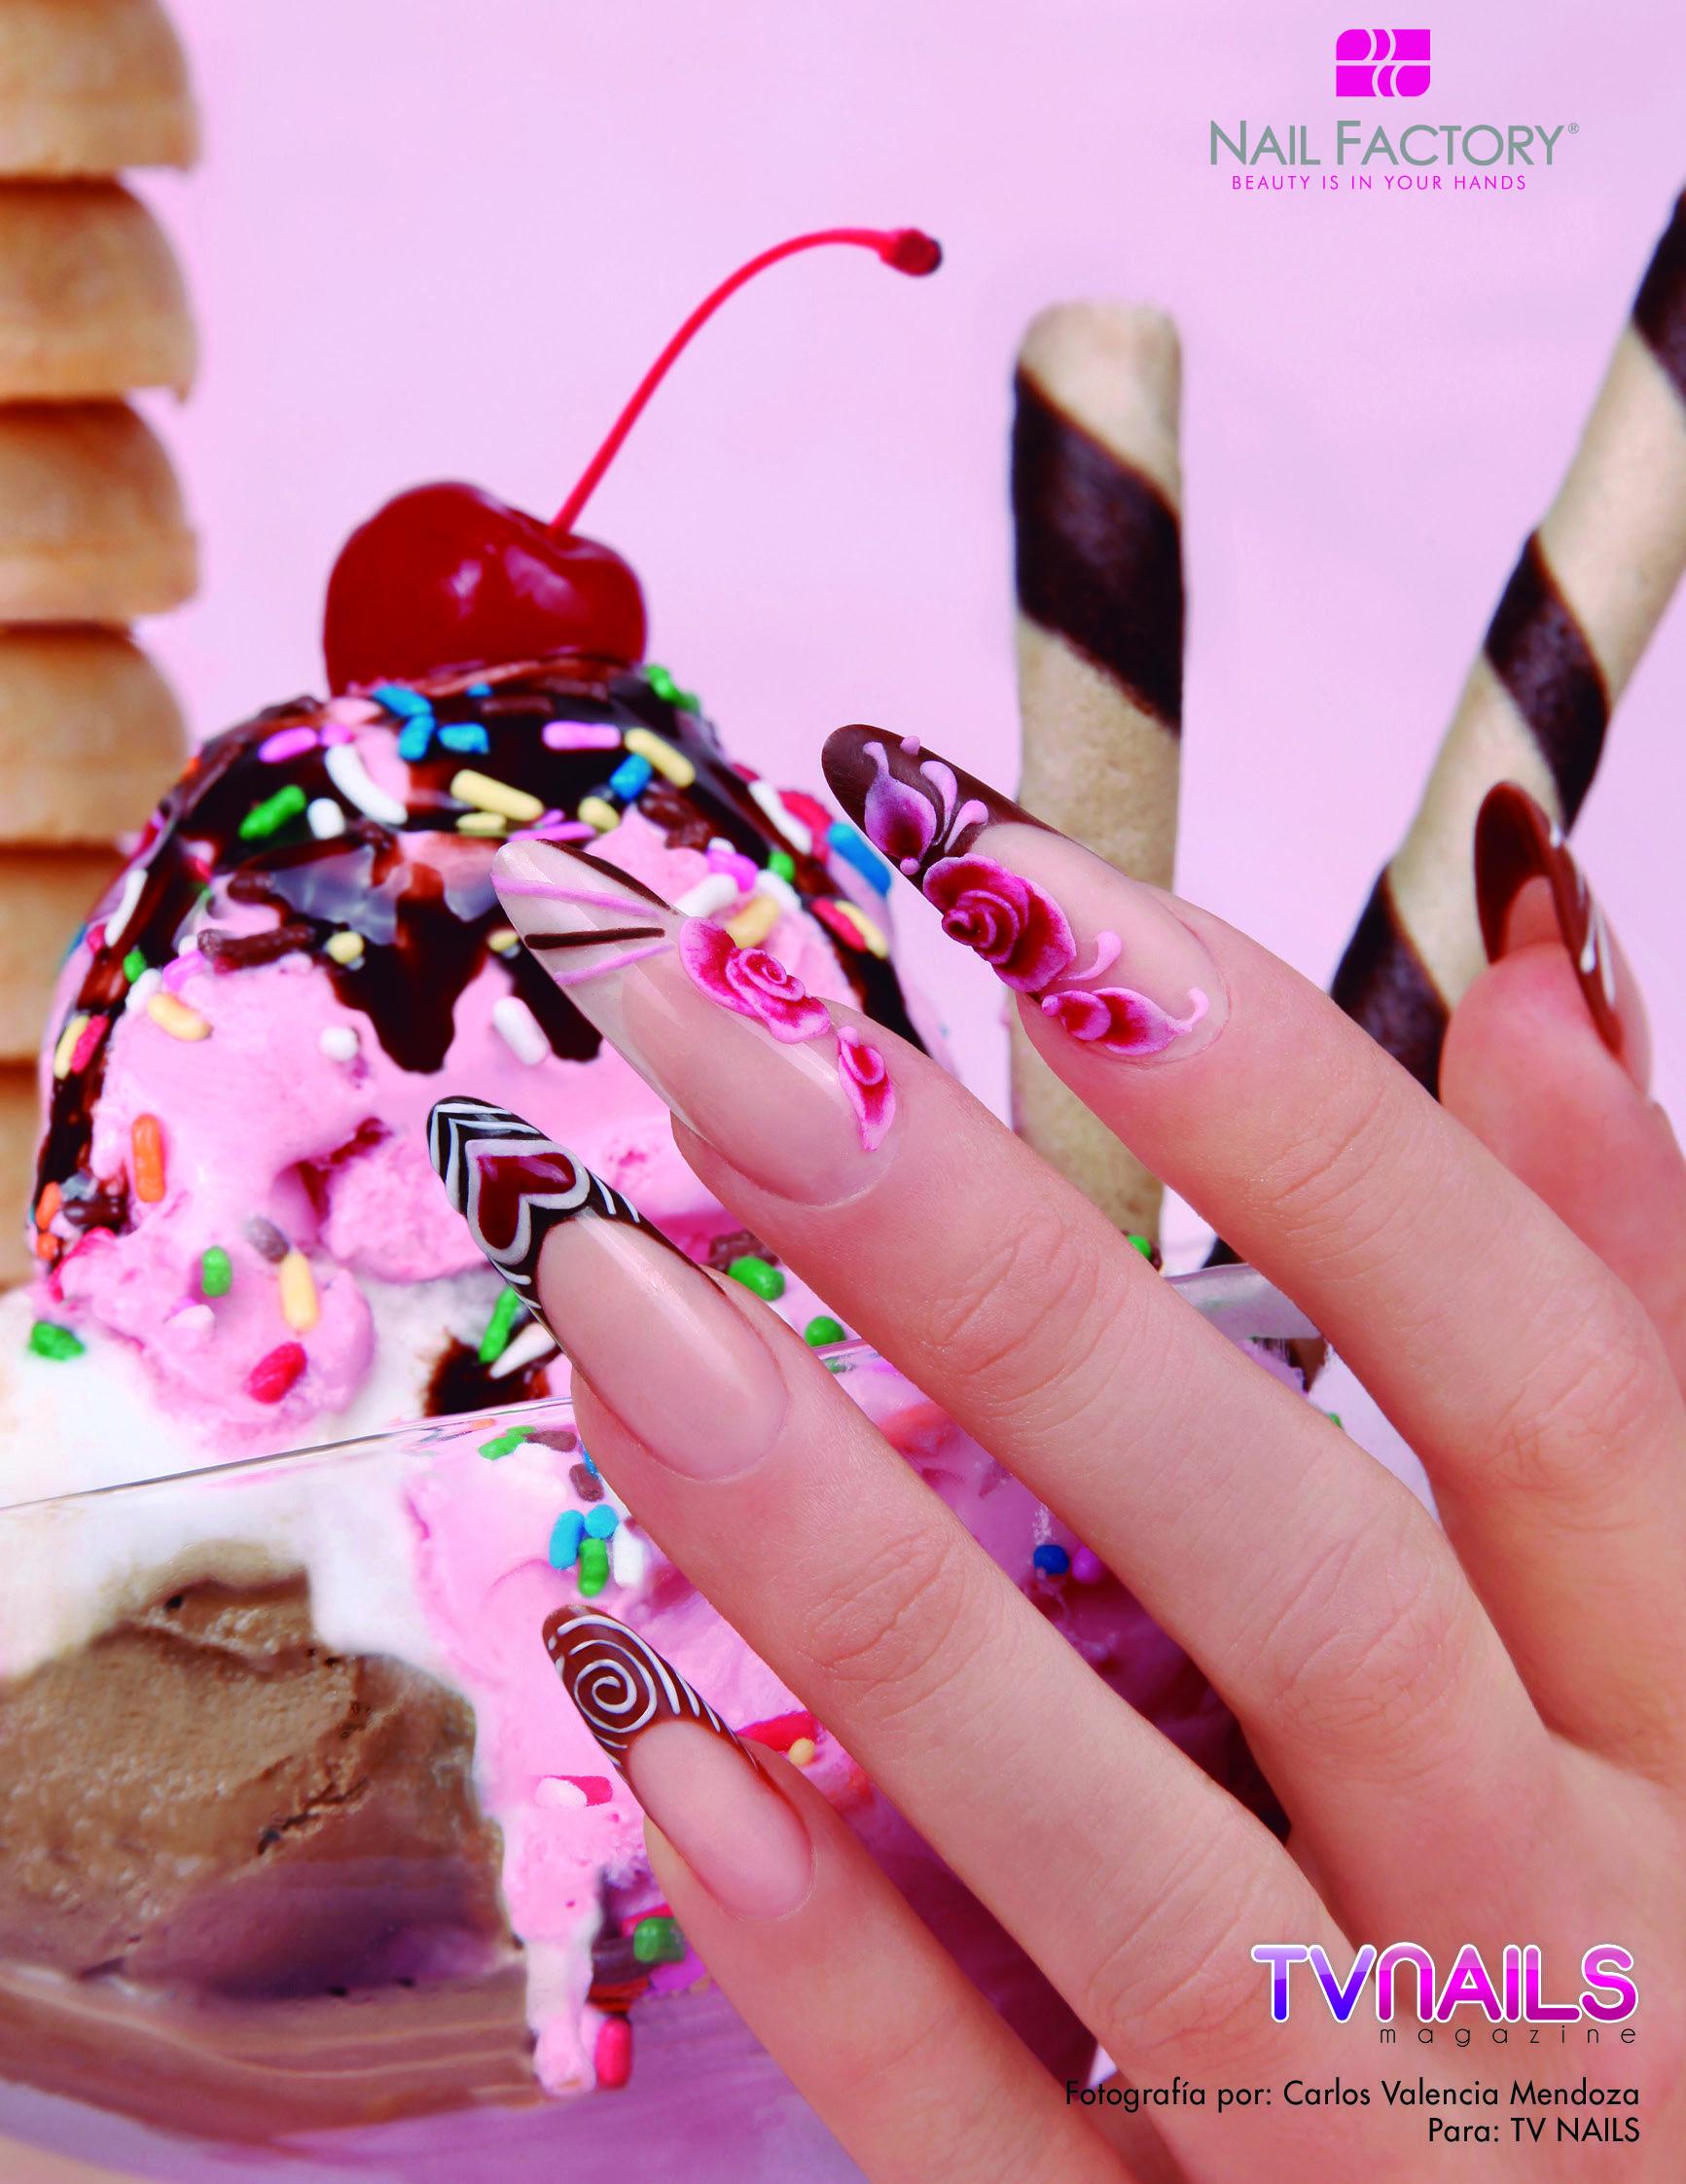 Nails Nailart Nail Unas Acrylic Acrilicas Lovenail